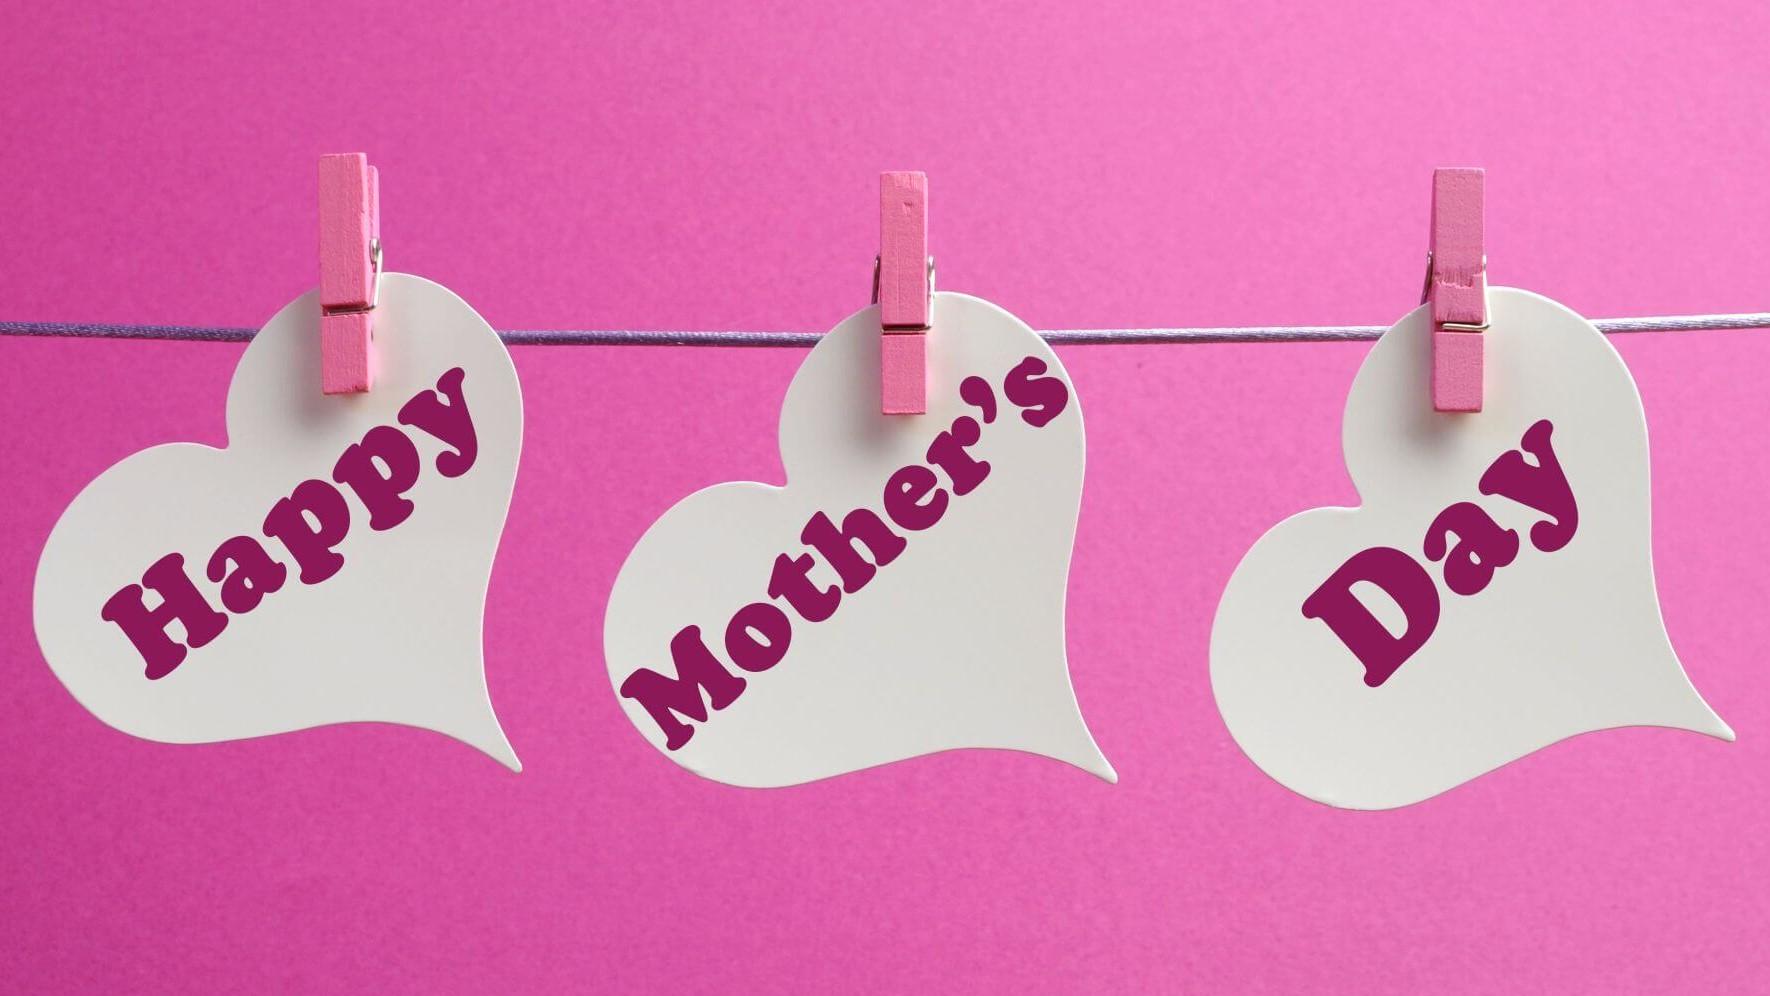 Two Moms - SU236